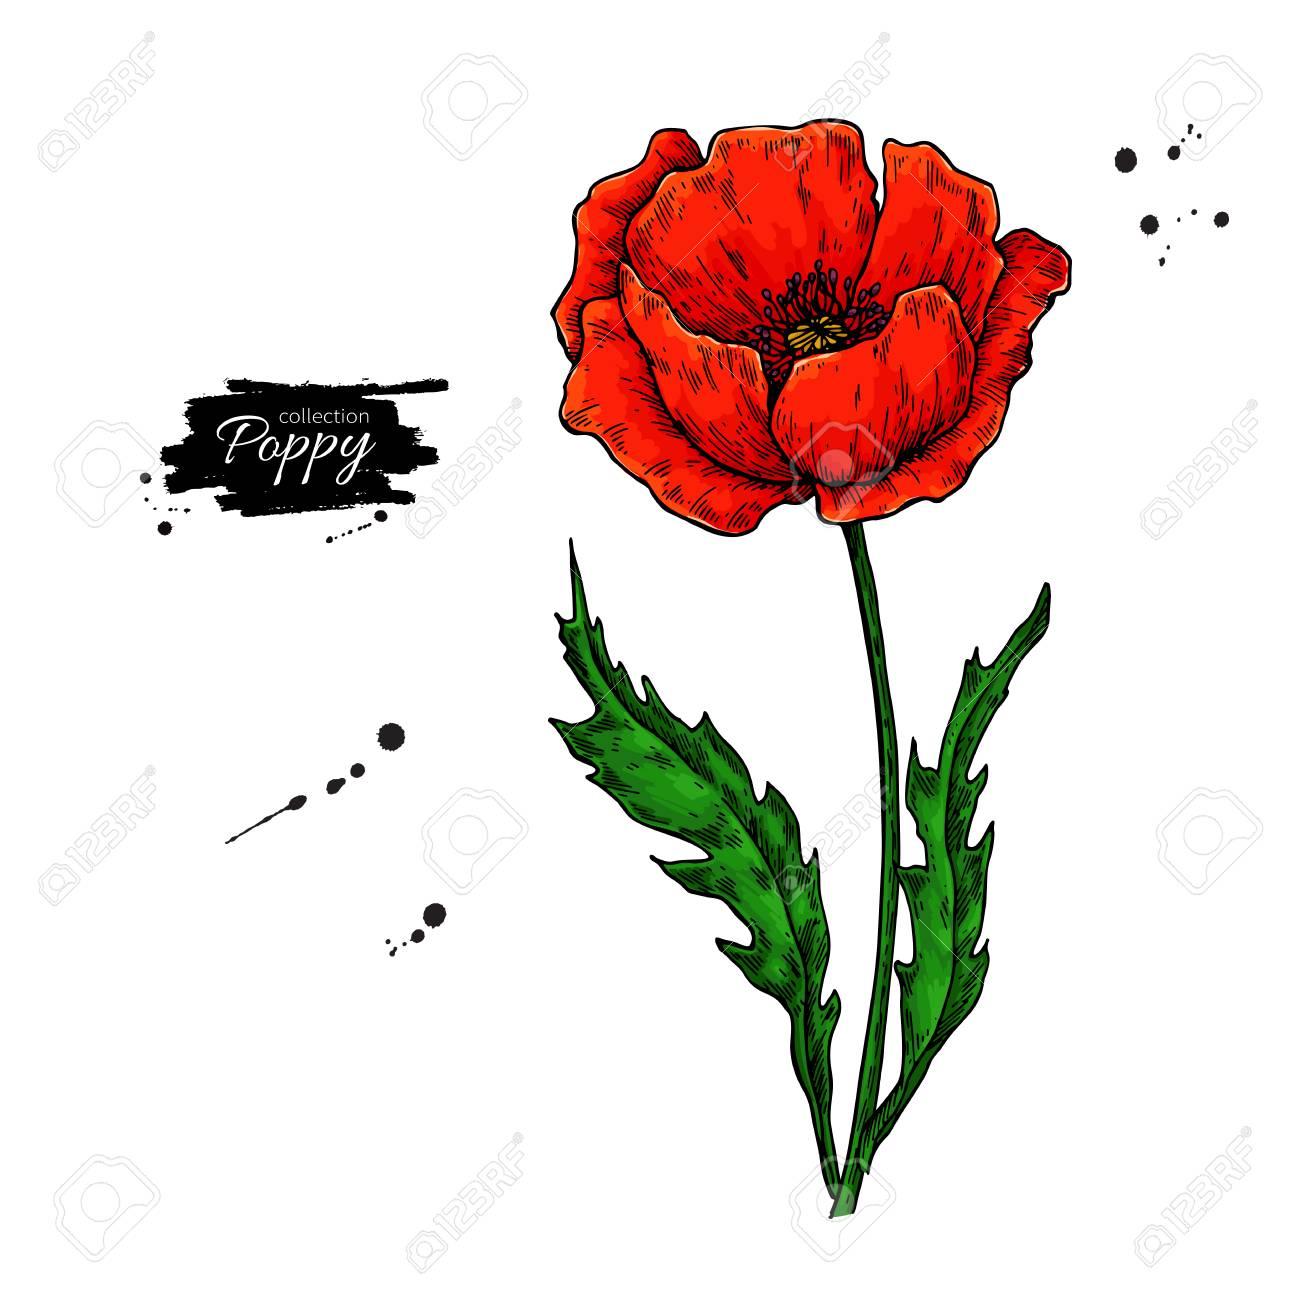 Poppy flower vector drawing set isolated wild plant and leaves poppy flower vector drawing set isolated wild plant and leaves in bouquet herbal artistic mightylinksfo